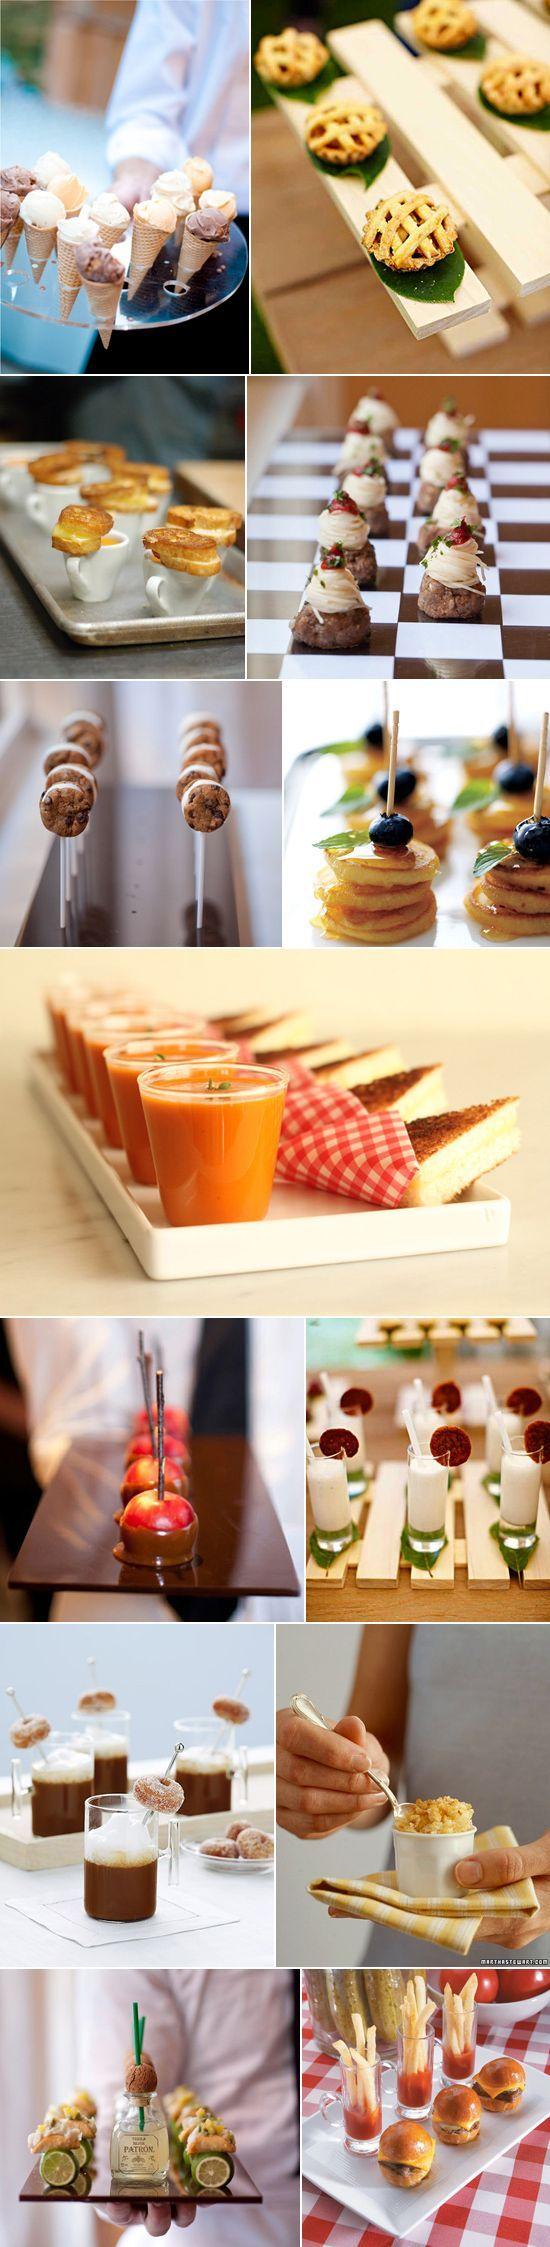 Wedding Midnight Snacks- very thoughtful love it! @Alexia L L L L Hankins would…